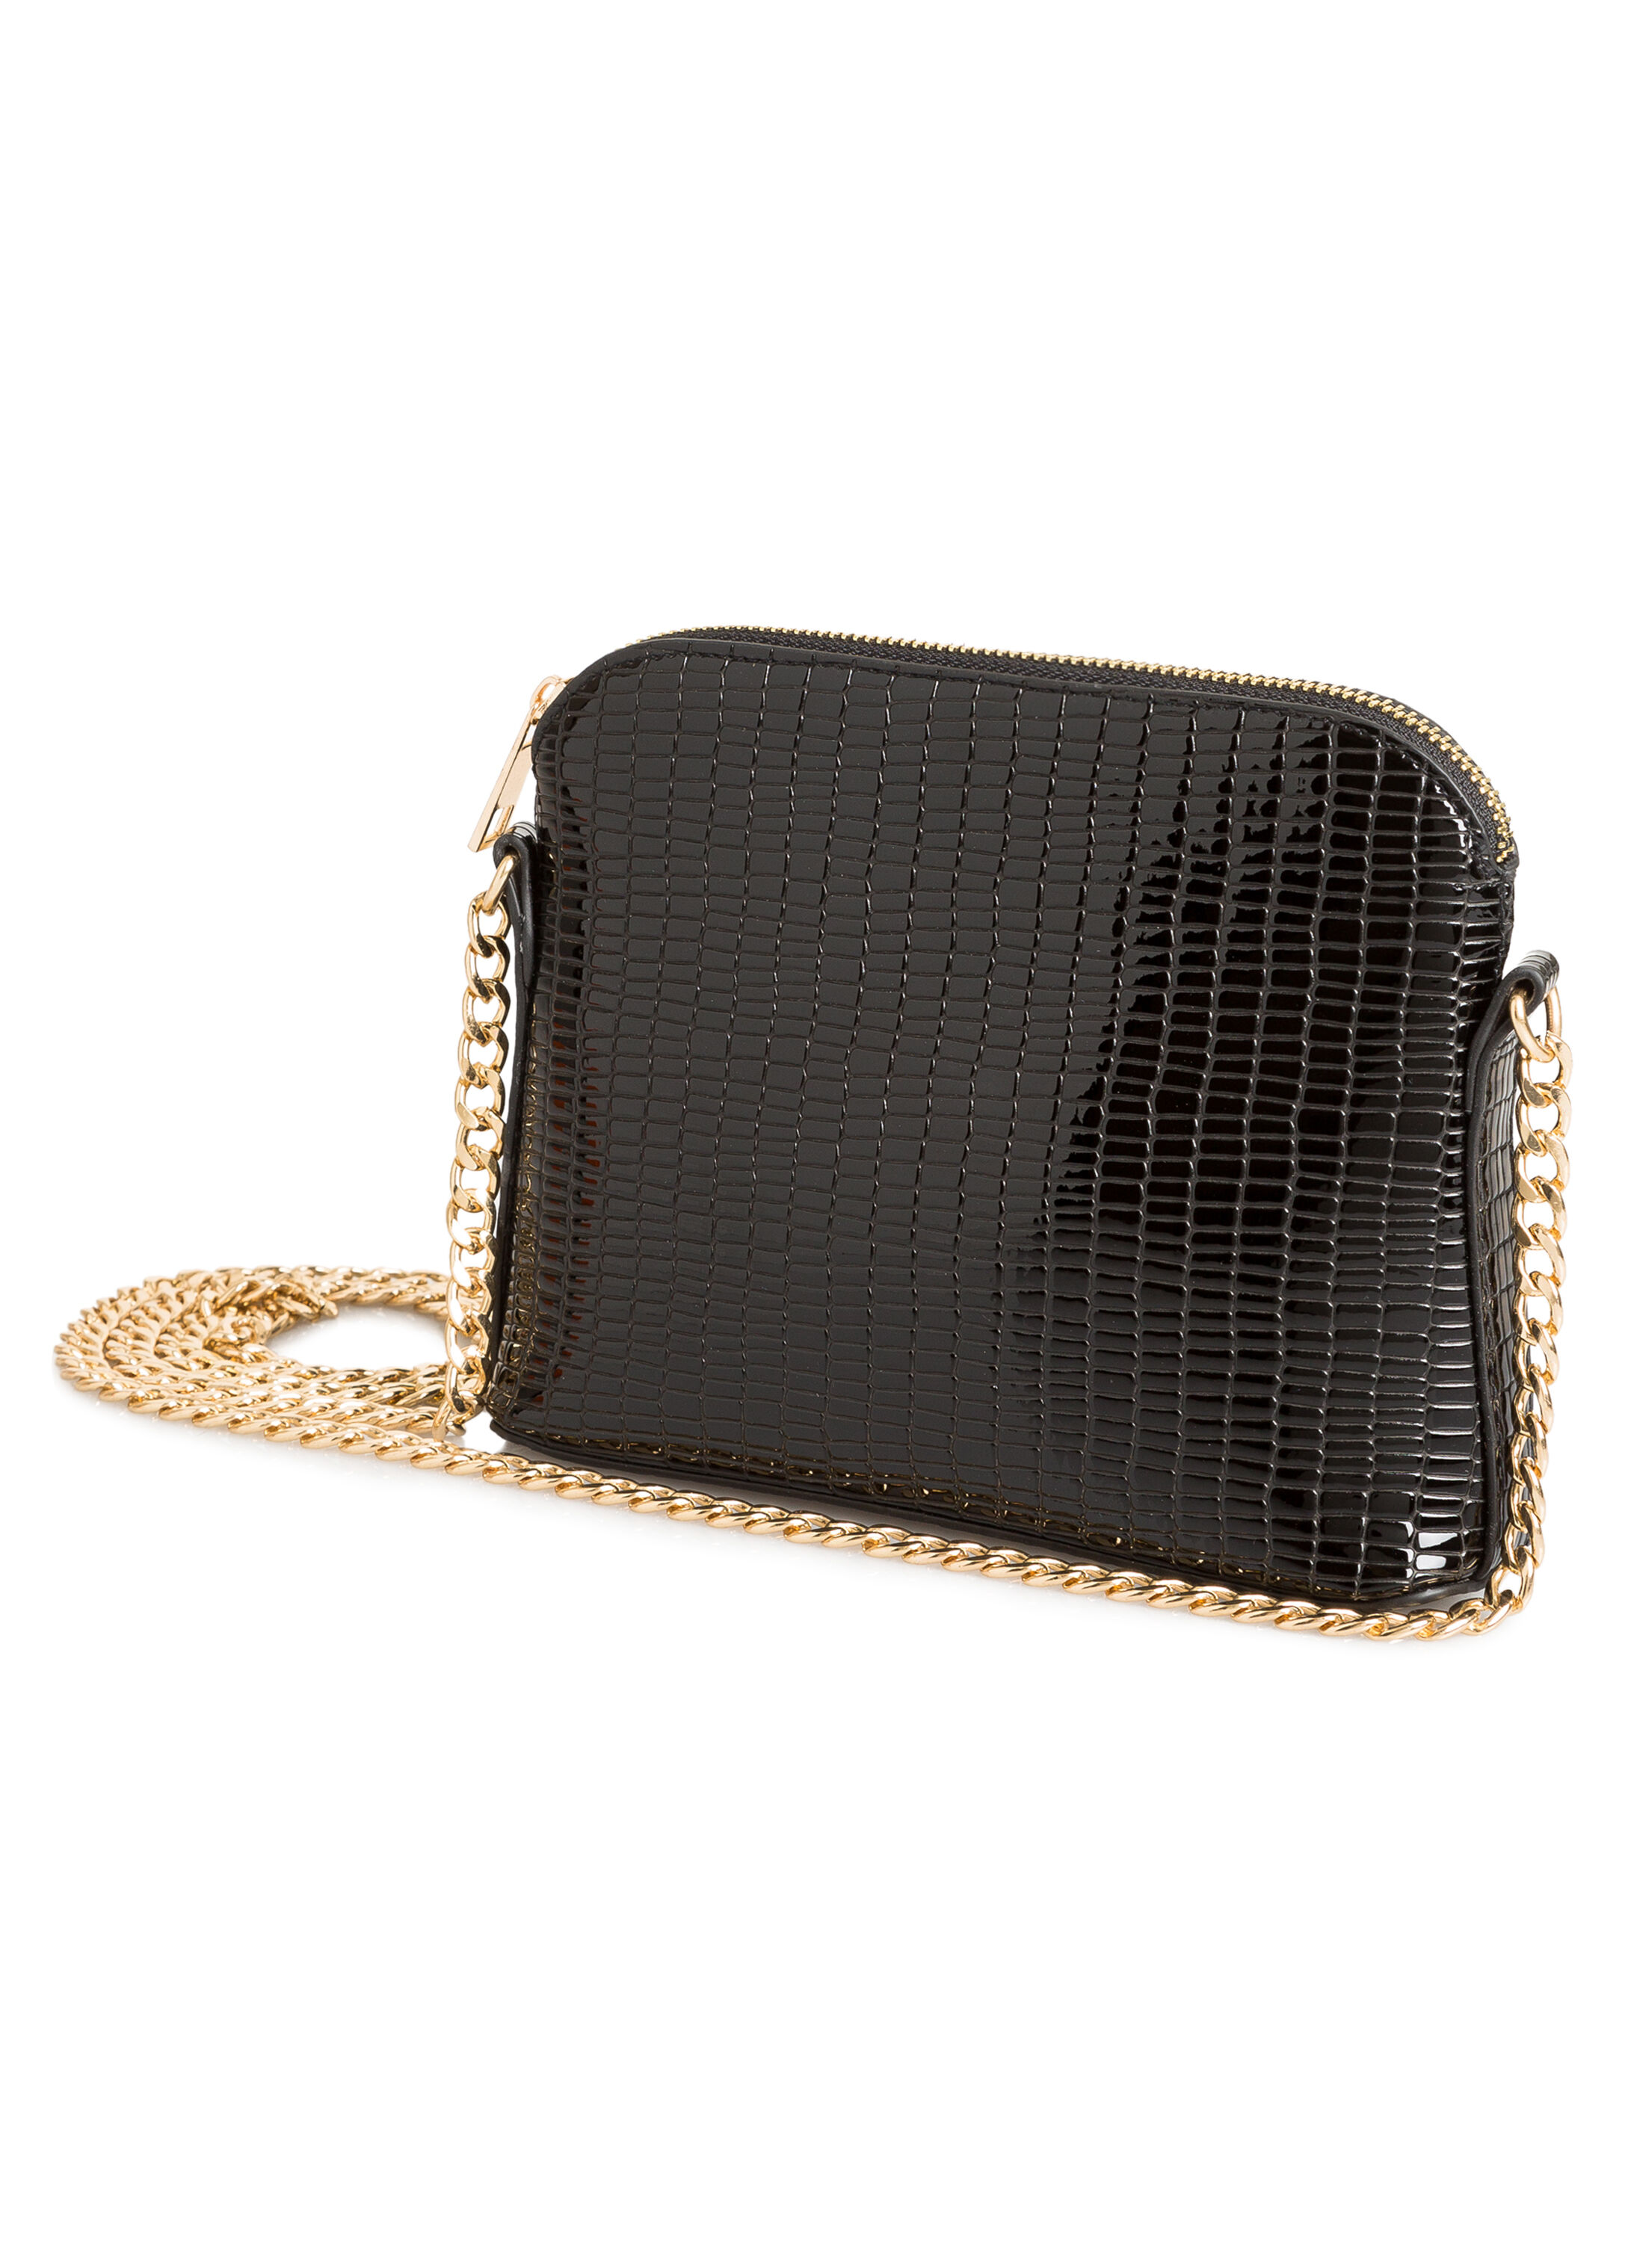 Patent Croc Chain Link Shoulder Bag